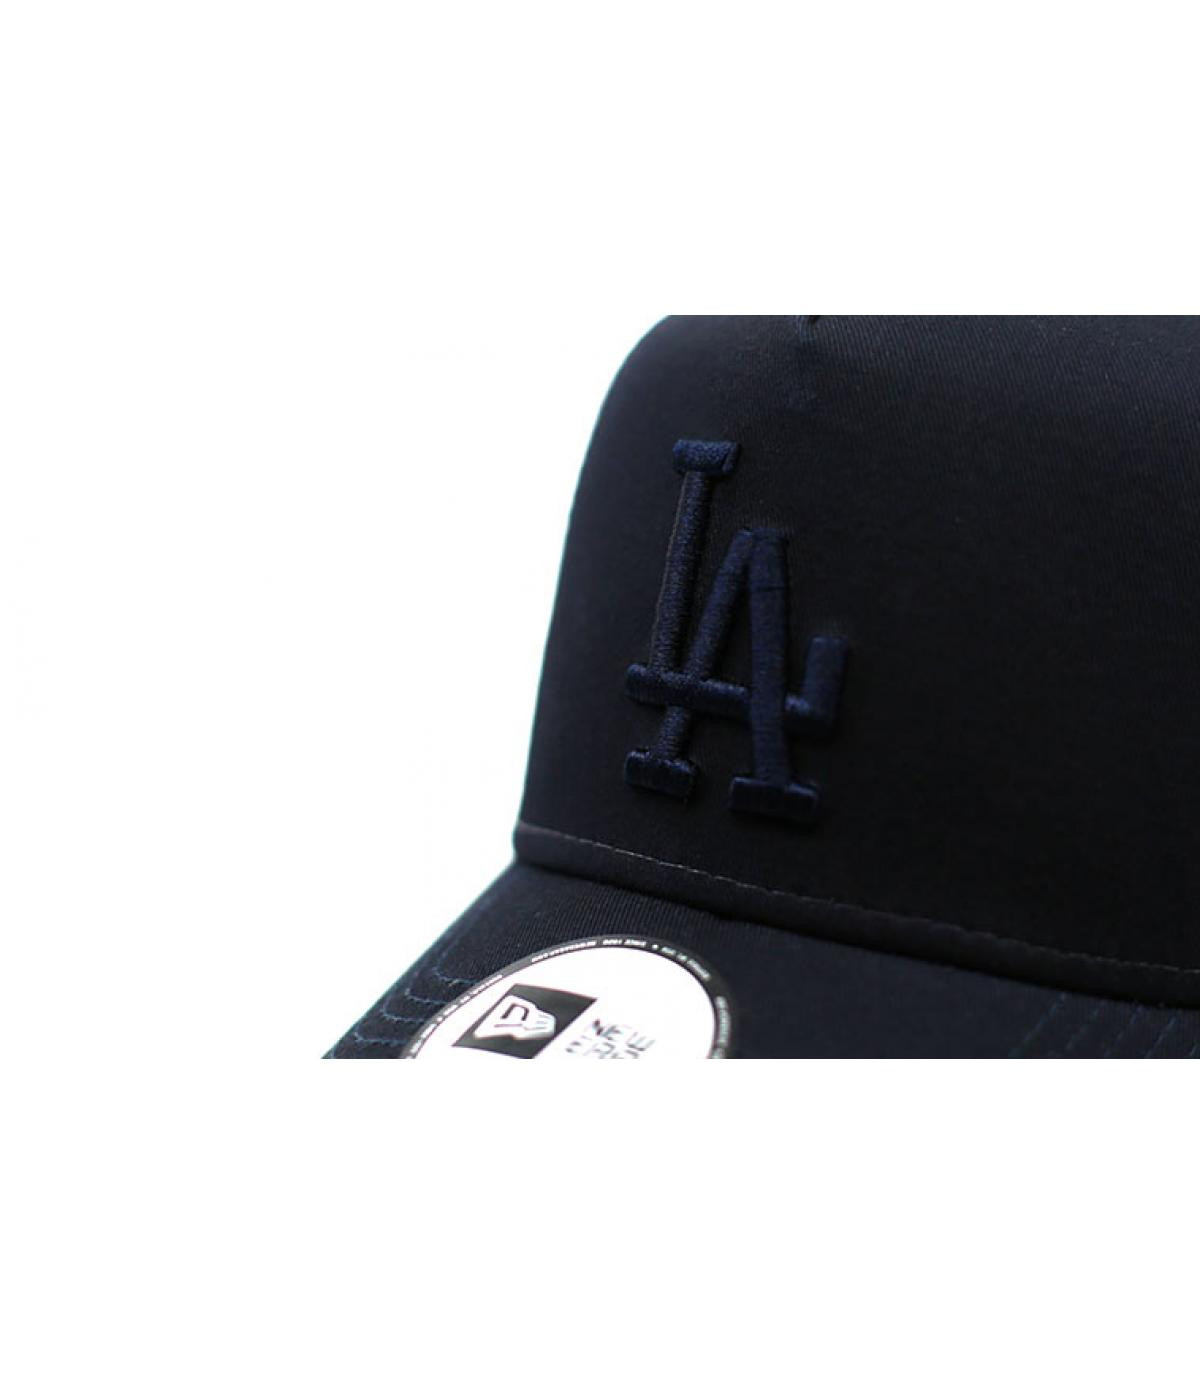 Details Trucker League Ess LA navy blush - Abbildung 3